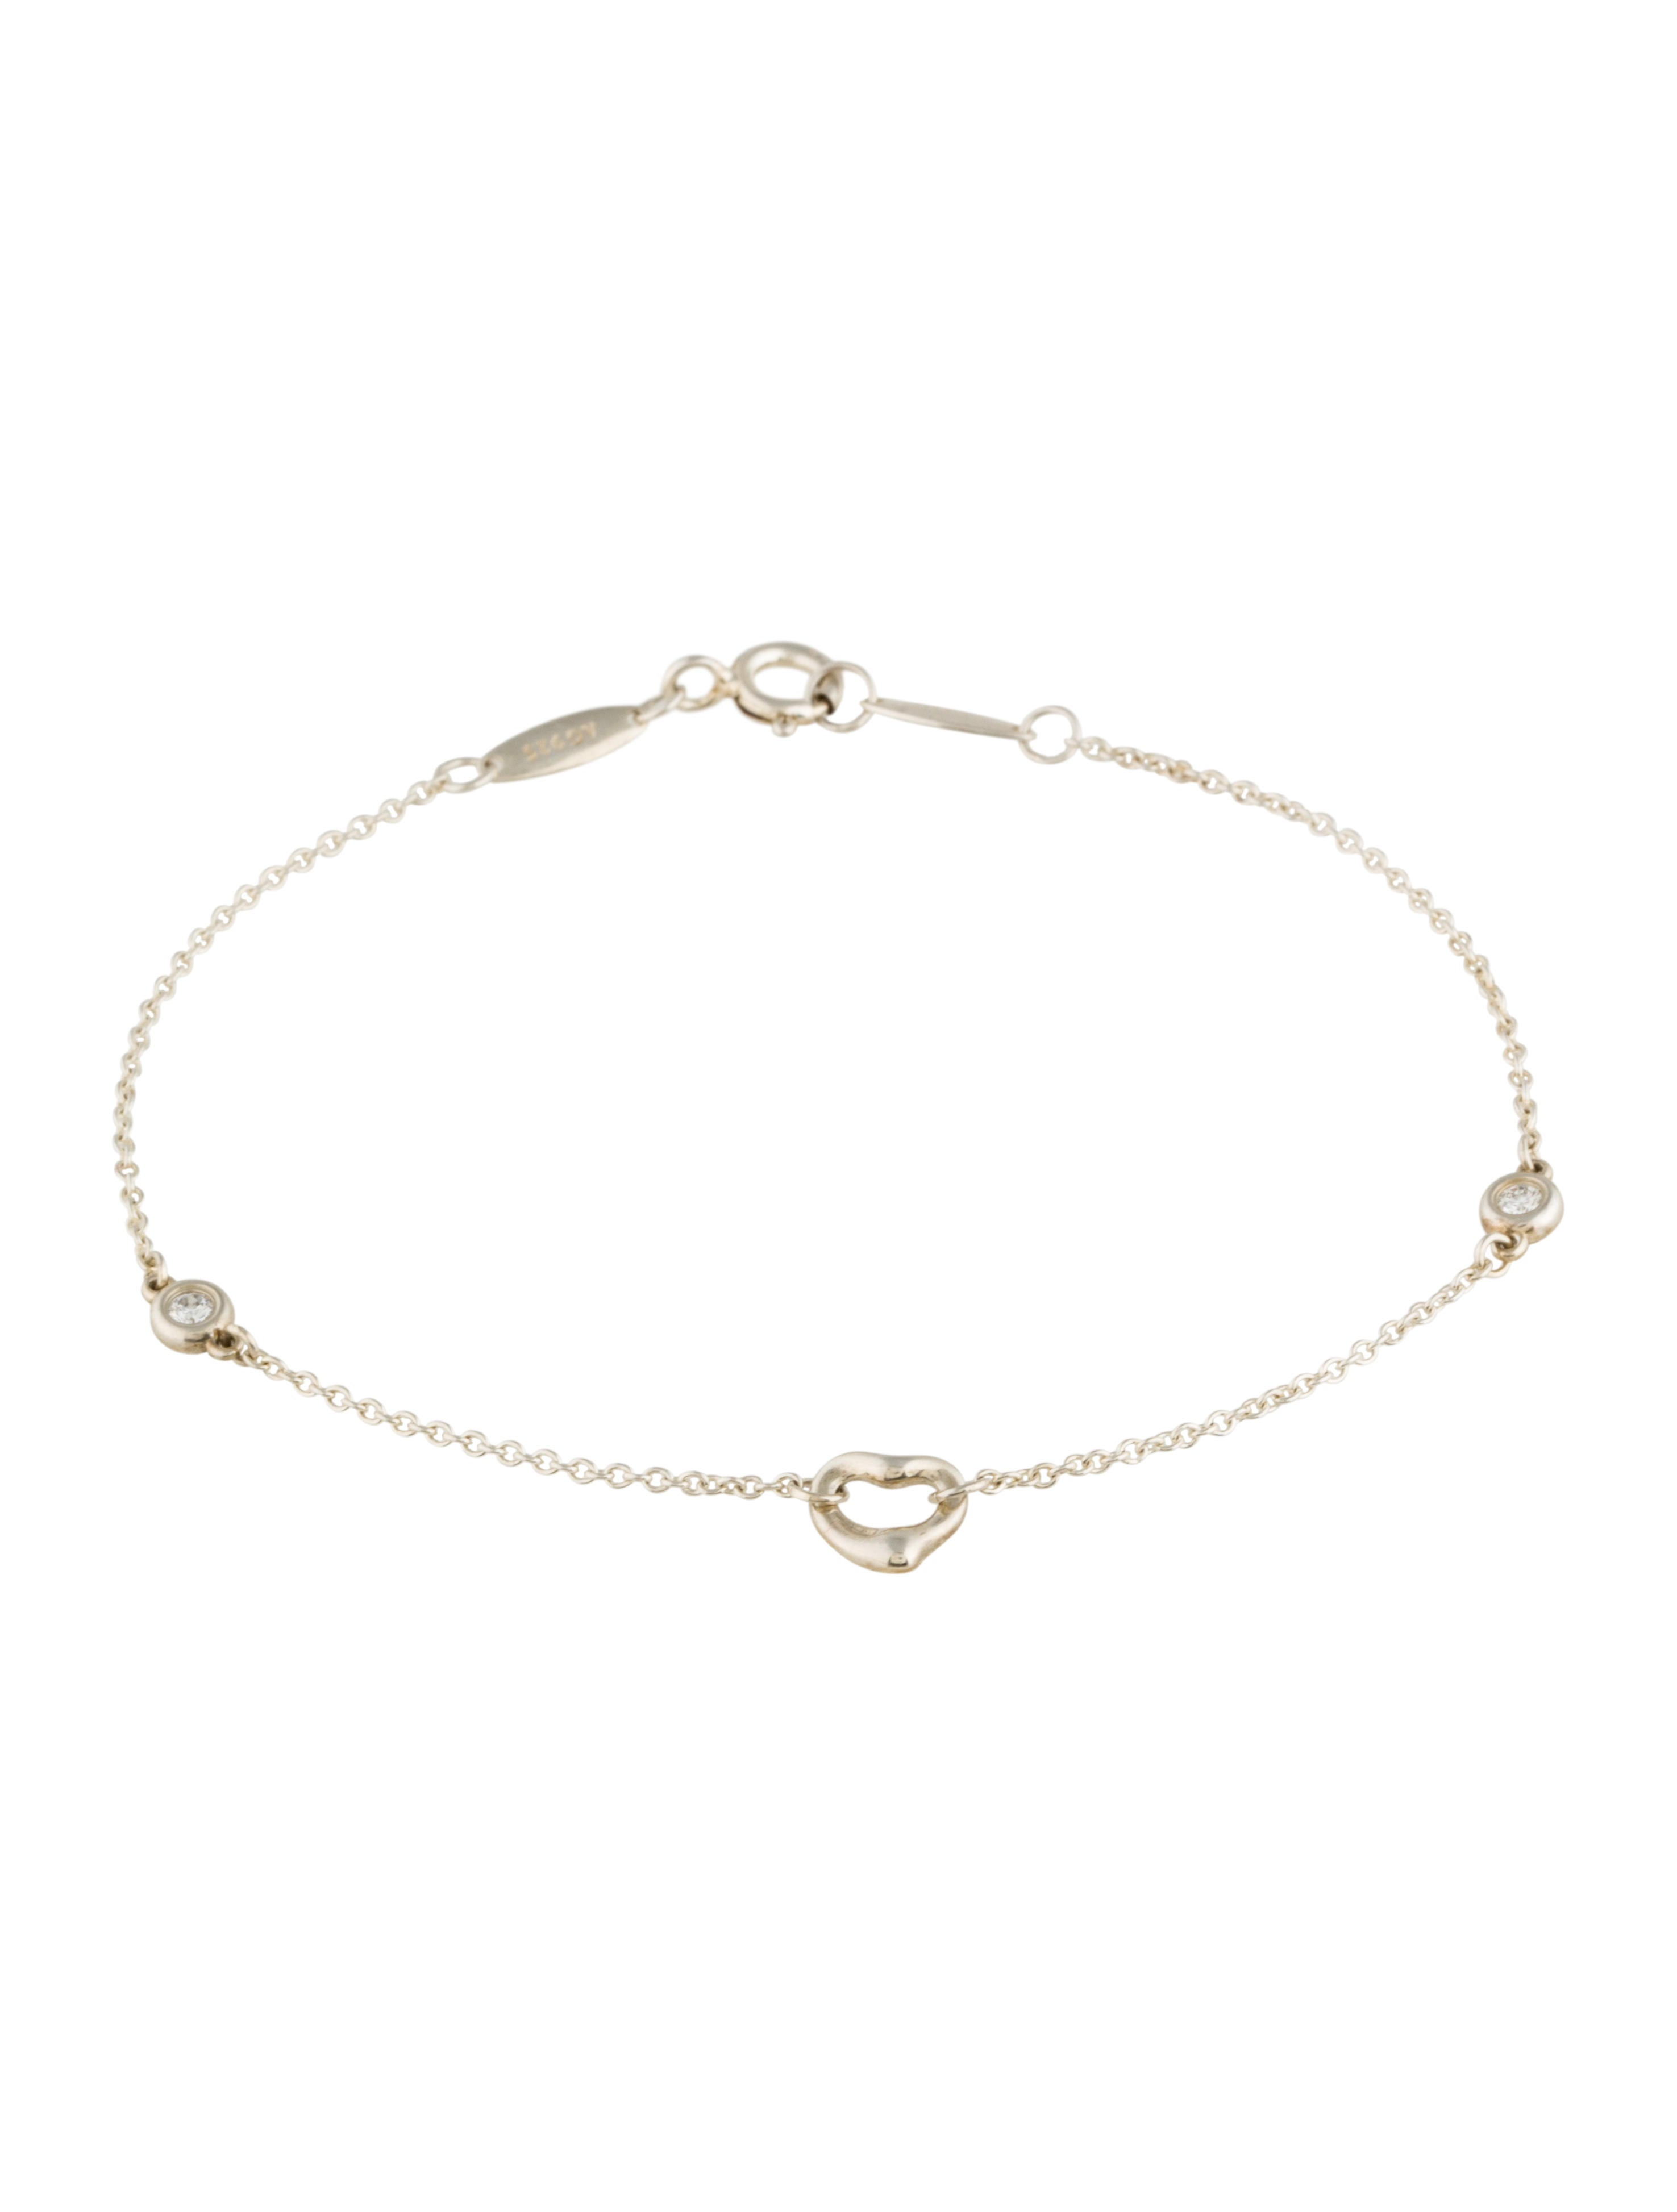 Tiffany co diamonds by the yard open heart bracelet for Diamonds by the yard ring